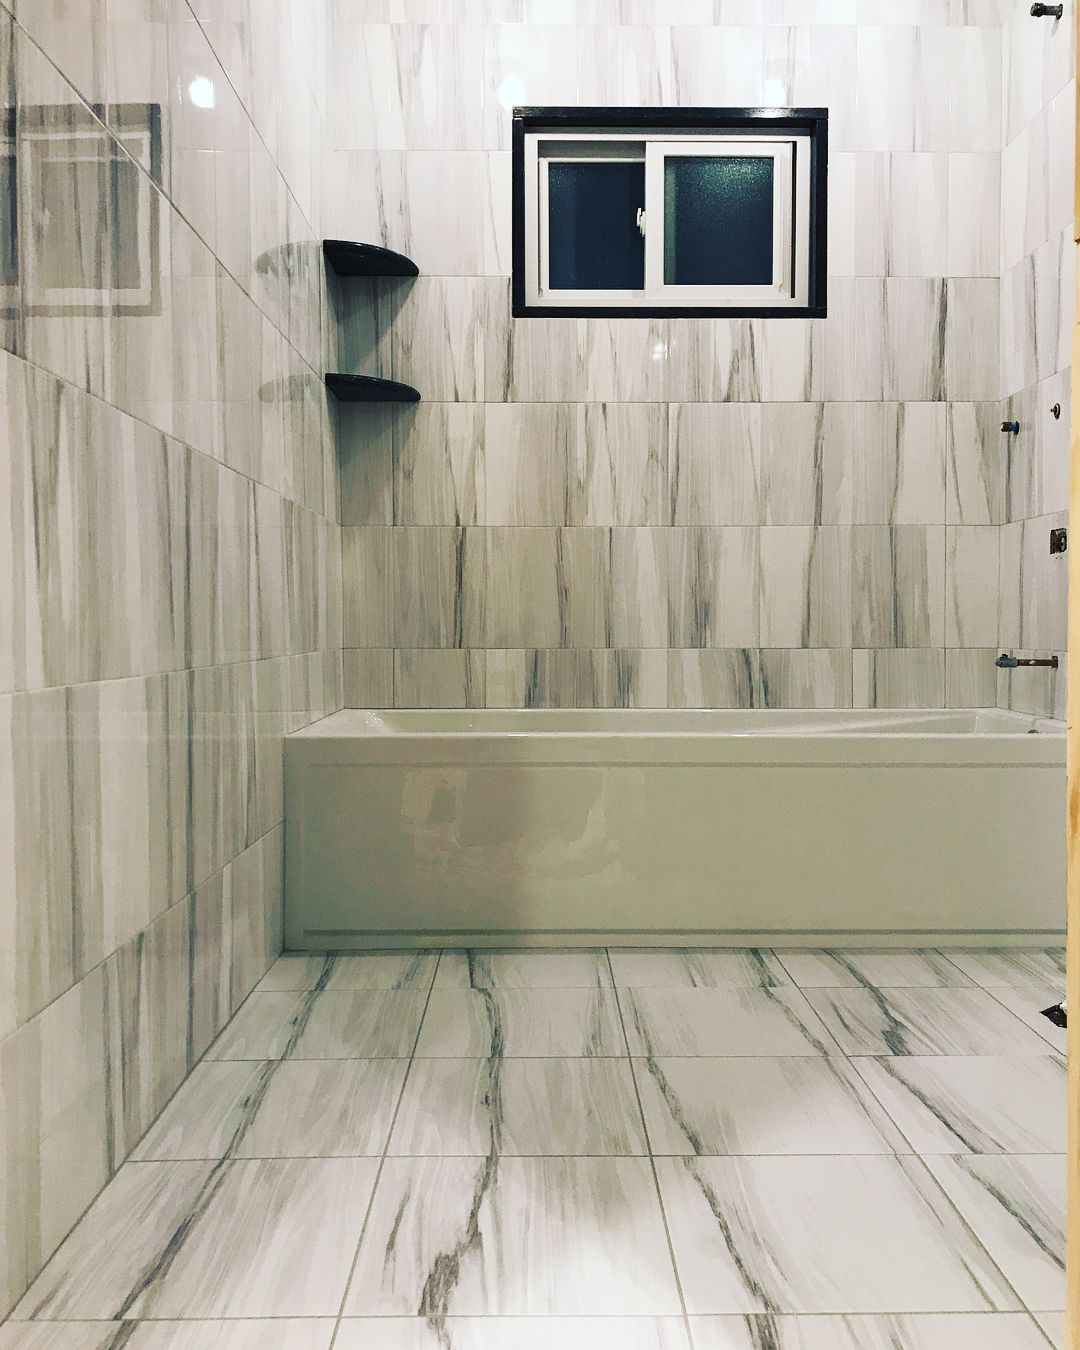 All Finished Wetilenyc Wisdomtileandstone Tile Tilework - Bathroom remodel queens